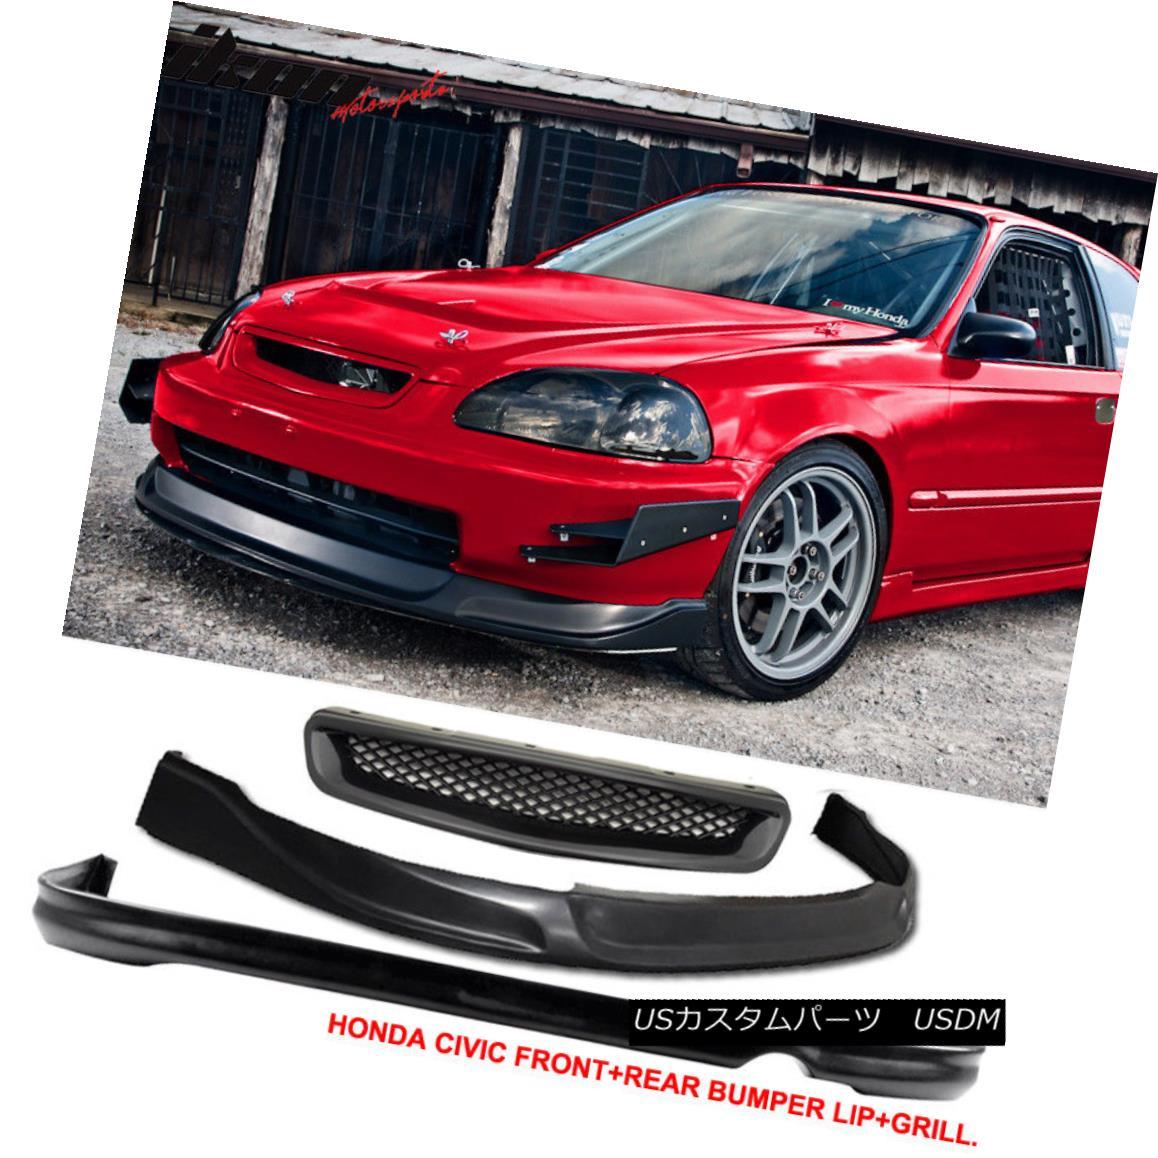 USグリル Fits 96-98 Honda Civic 2Dr/4Dr CONCEPT Front + Rear Bumper Lip + TR Hood Grill フィット96-98ホンダシビック2Dr / 4Dr CONCEPTフロント+リアバンパーリップ+ TRフードグリル